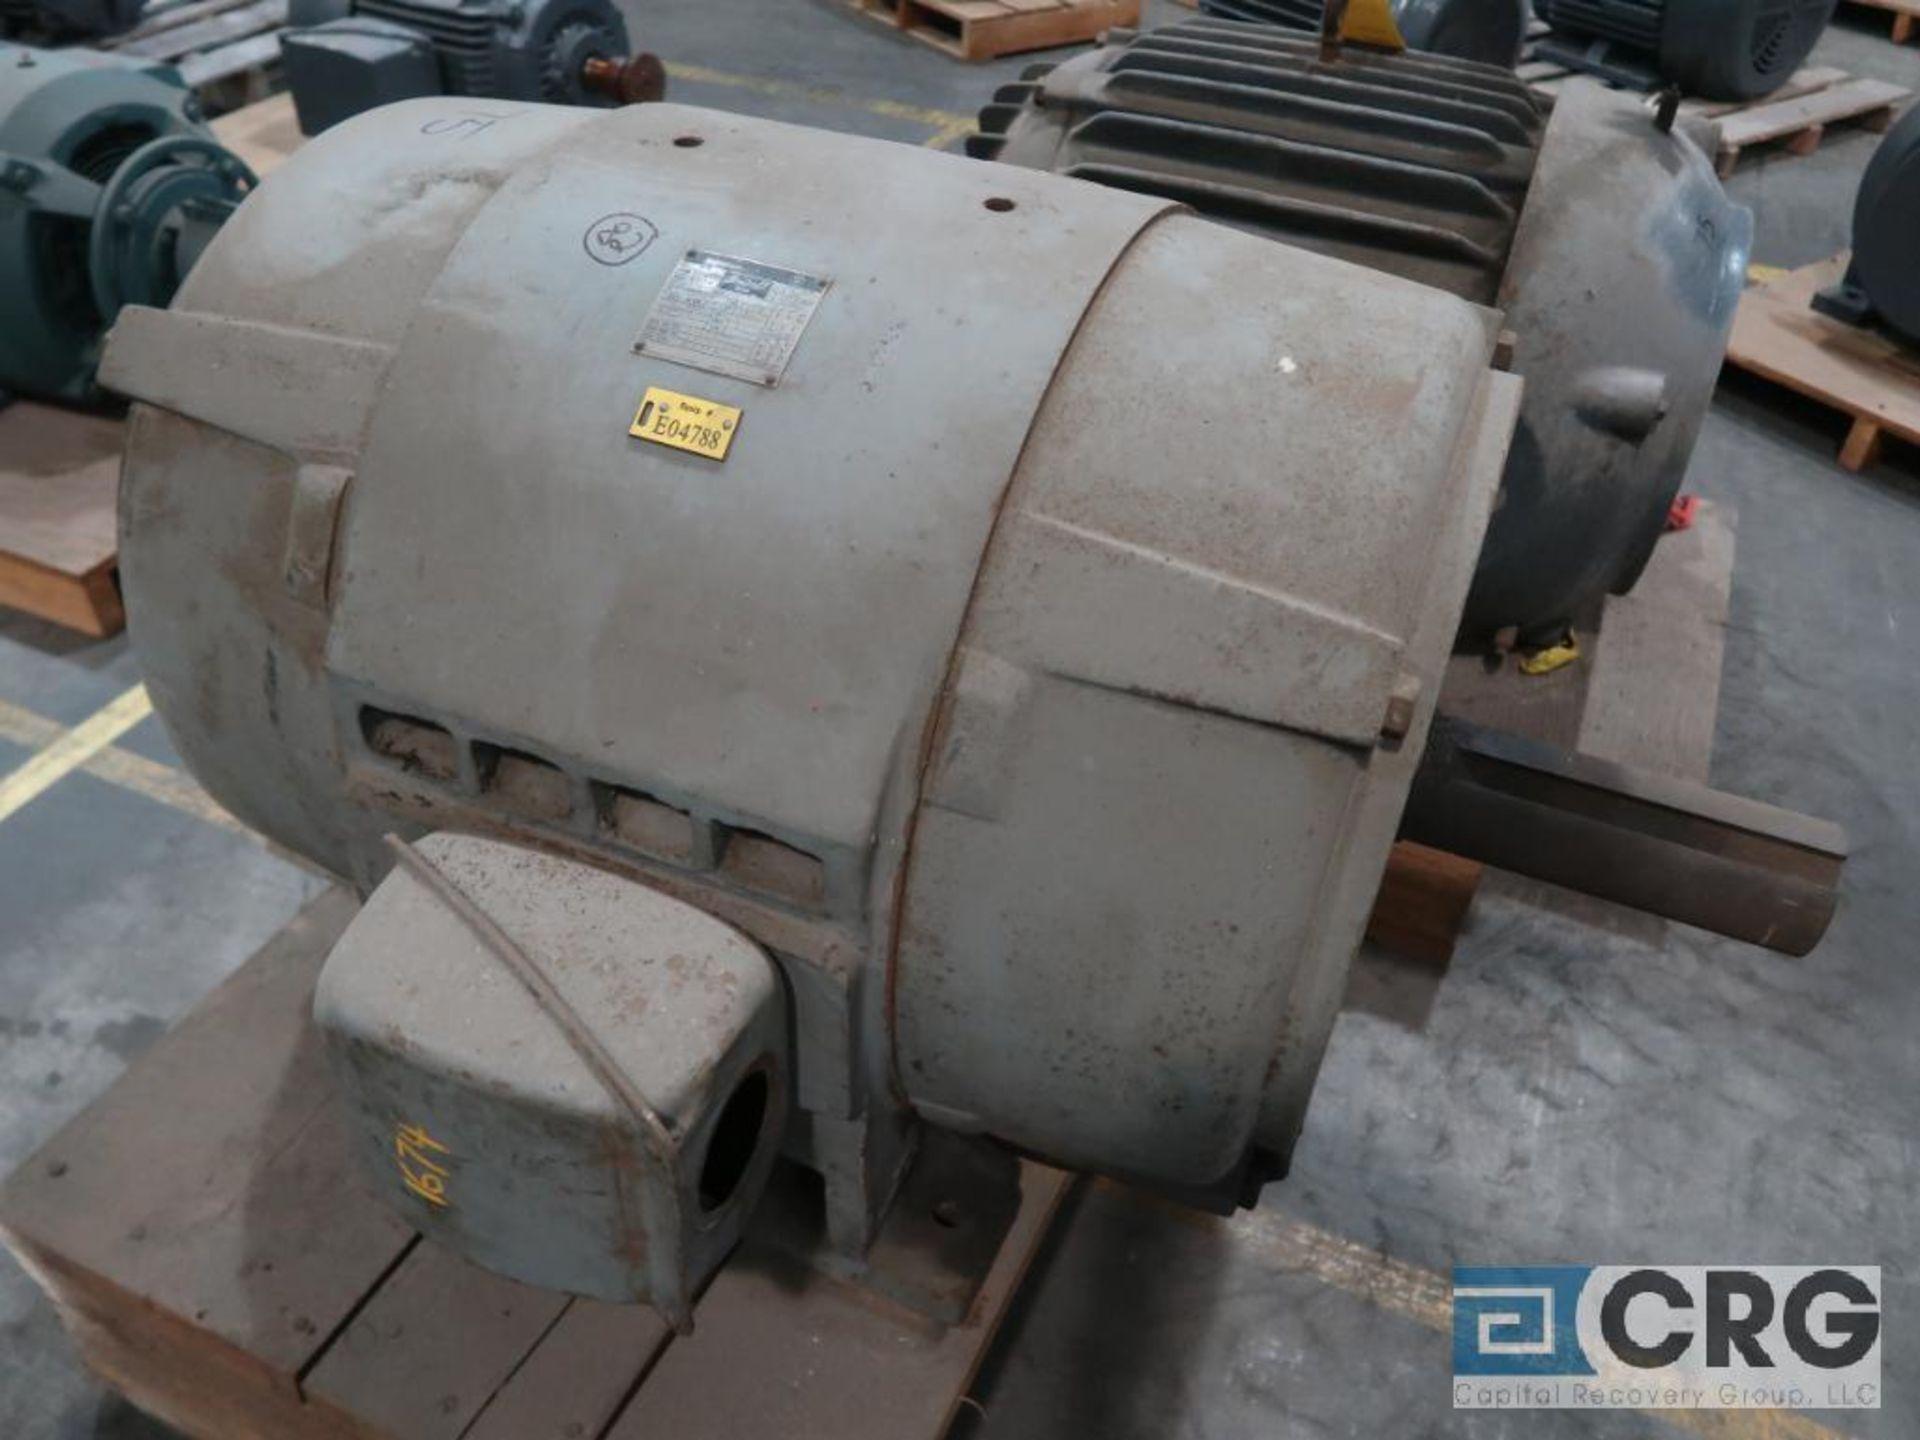 Westinghouse Life-Line A motor, 75 HP, 885 RPMs, 220/440 volt, 3 ph., 504UU frame (Finish Building)